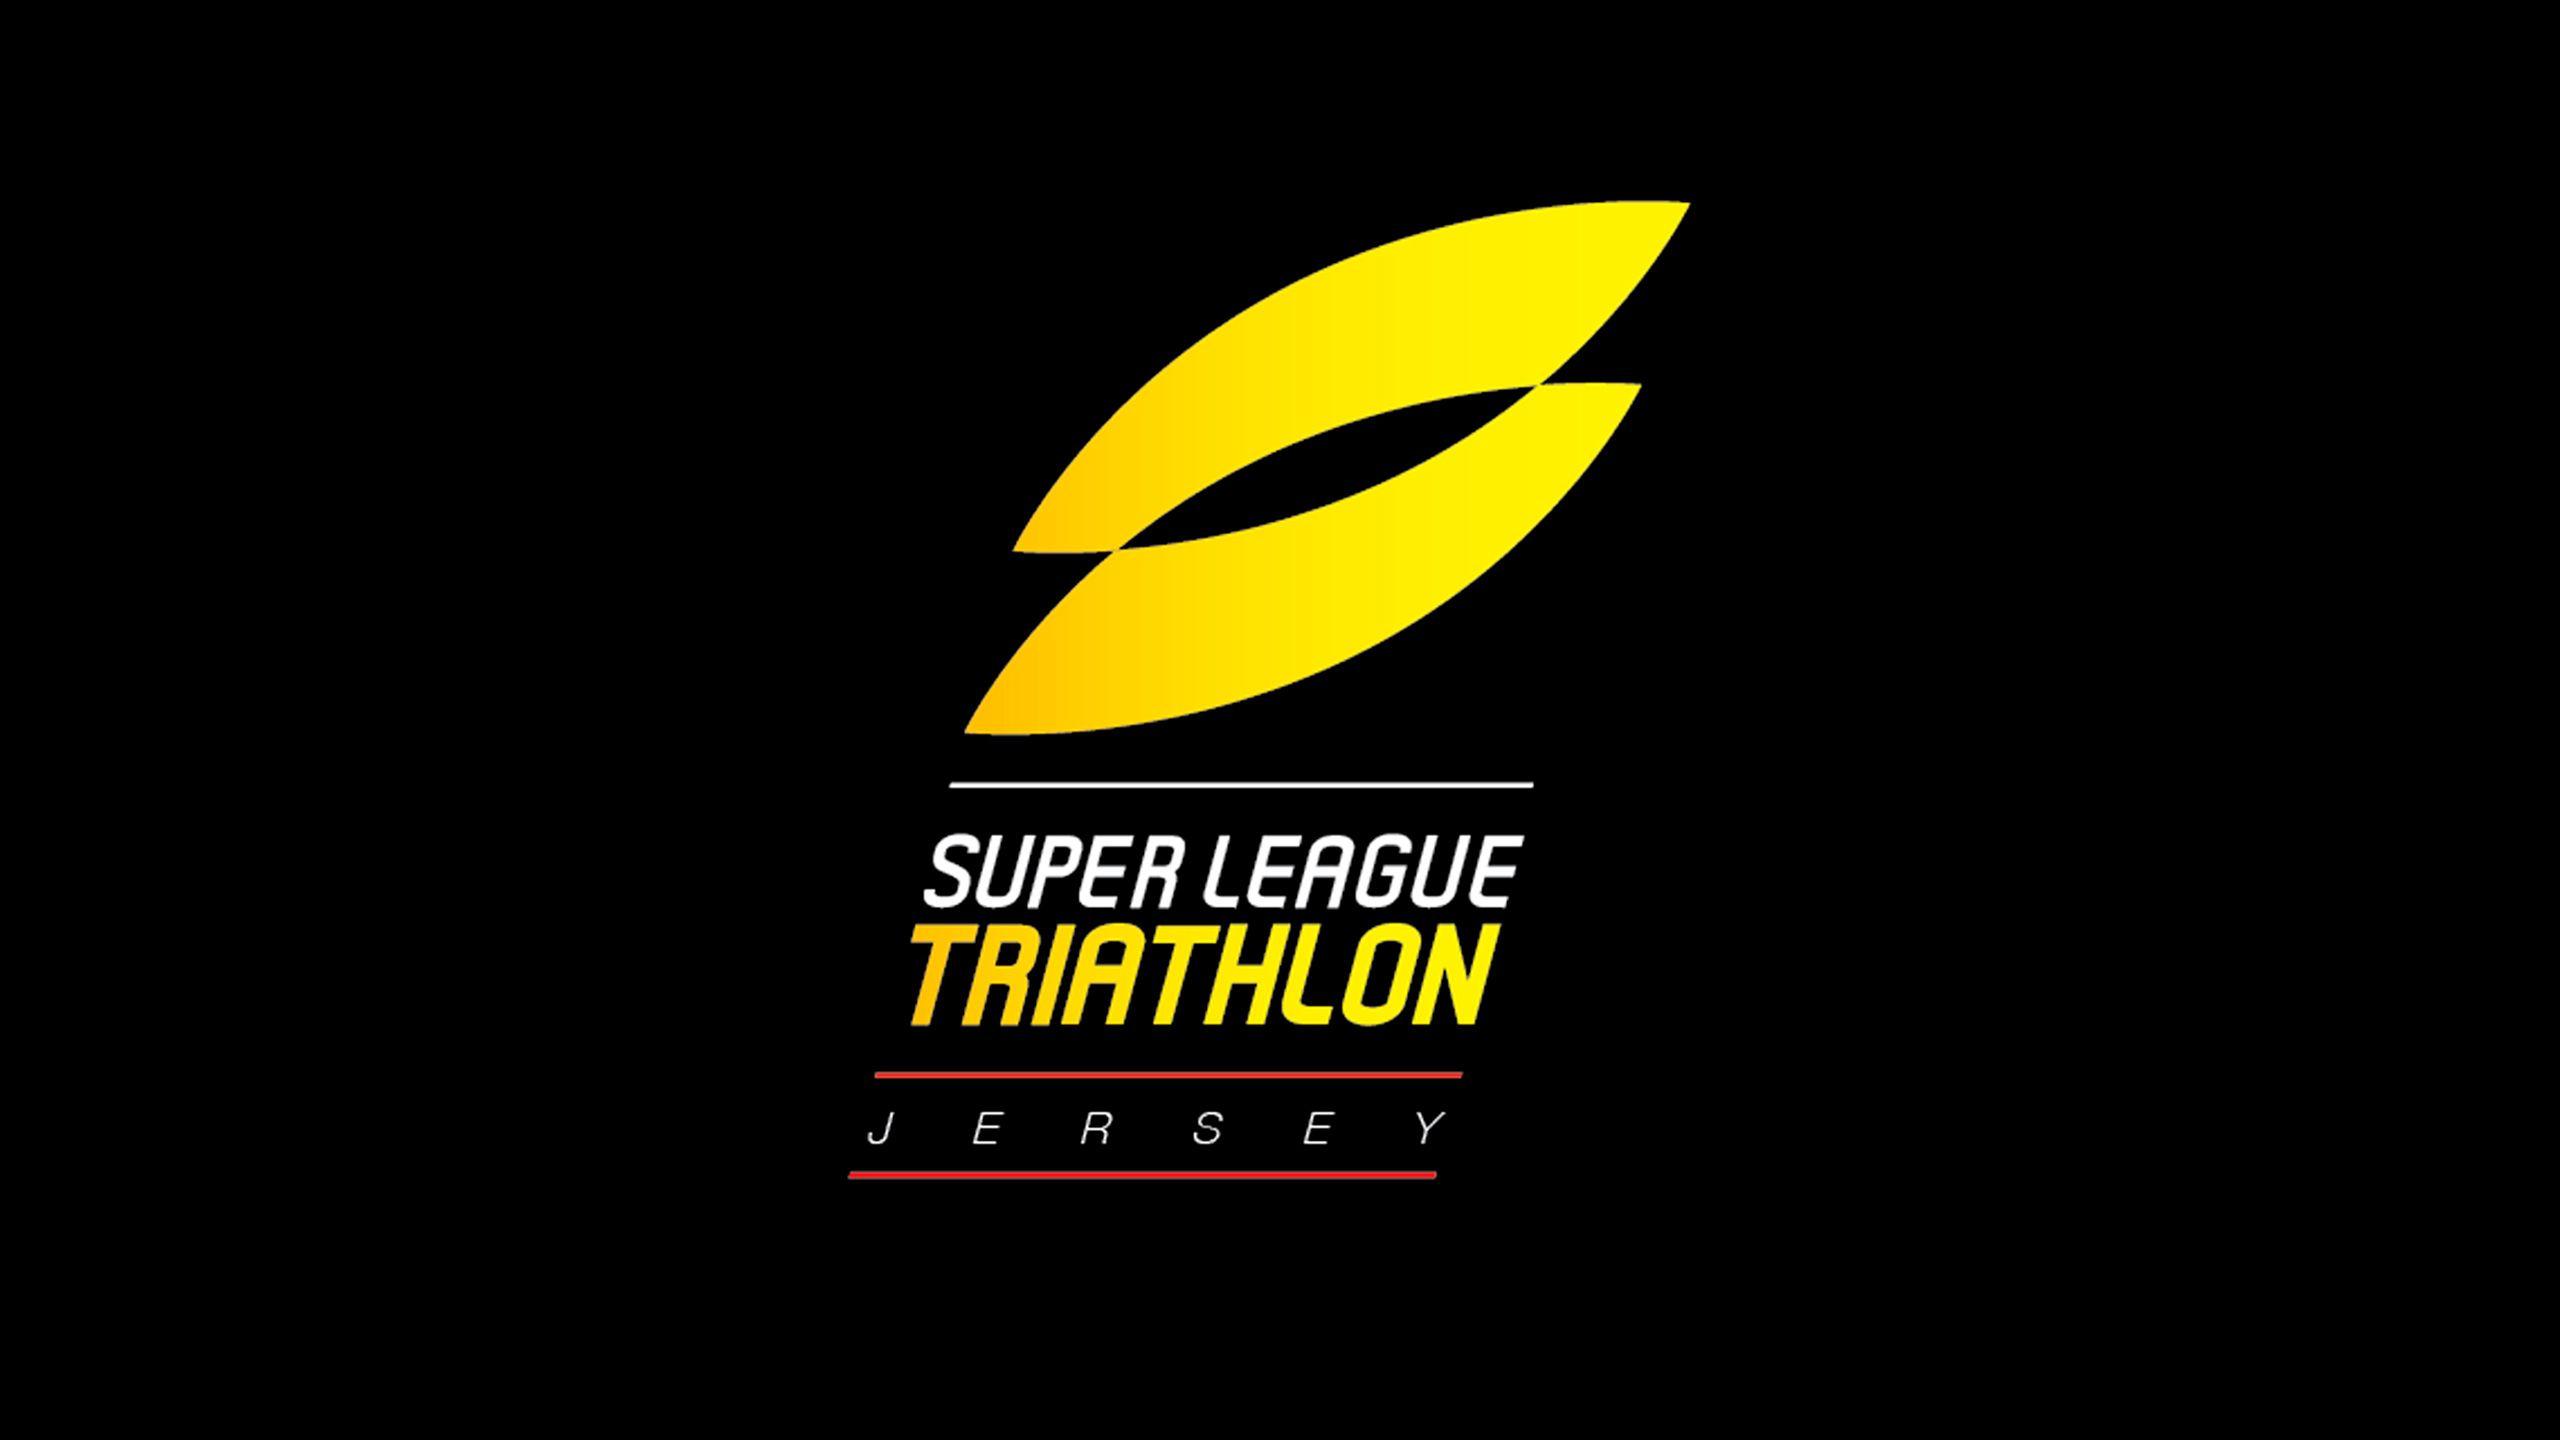 Super League Triathlon: Jersey (Women's Eliminator)